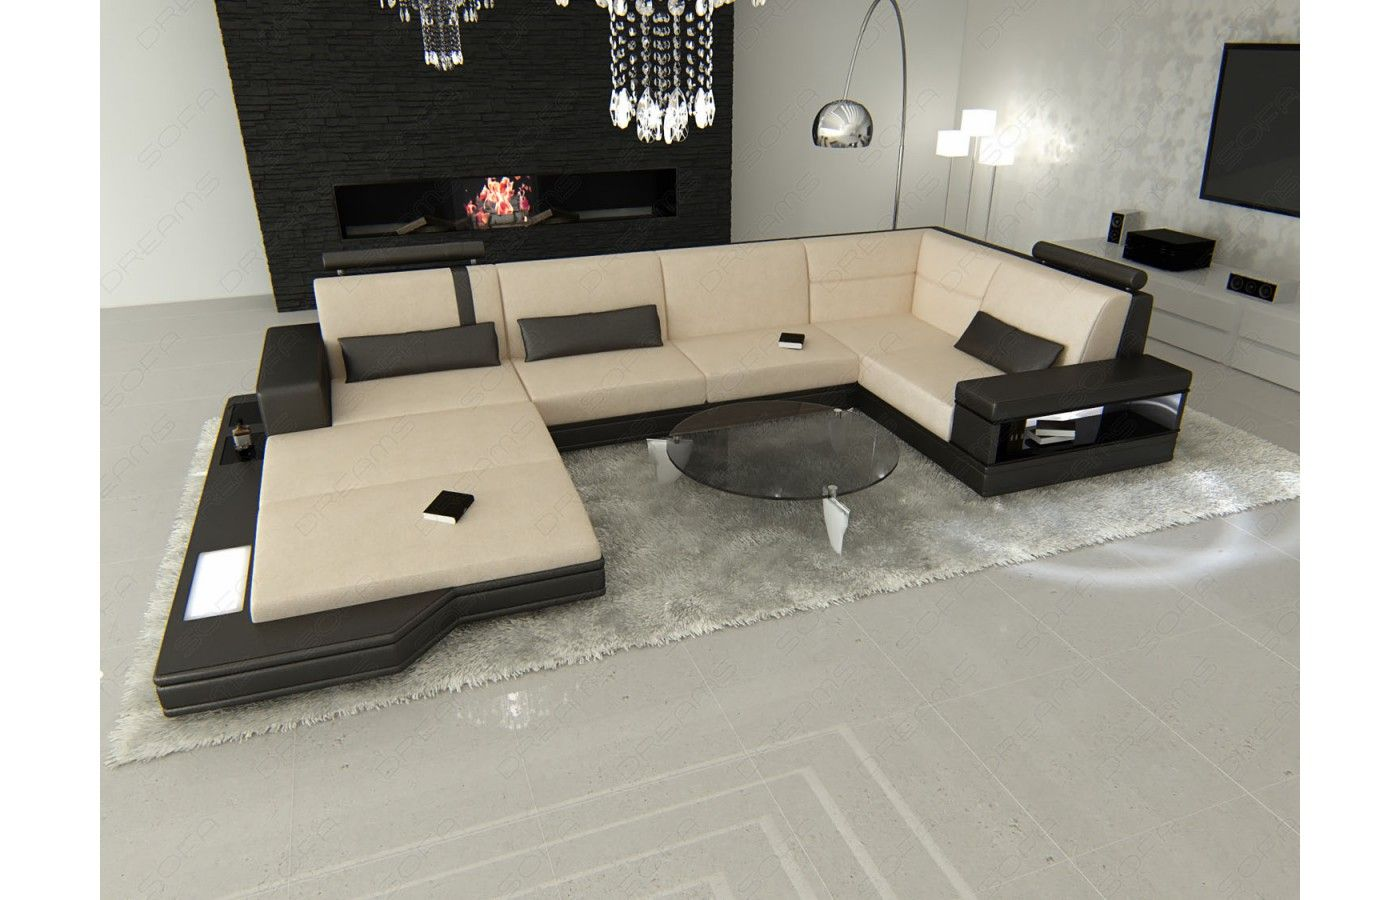 stoff wohnlandschaft messana stoff wohnlandschaft messana u form wohnlandschaft wohnen und. Black Bedroom Furniture Sets. Home Design Ideas